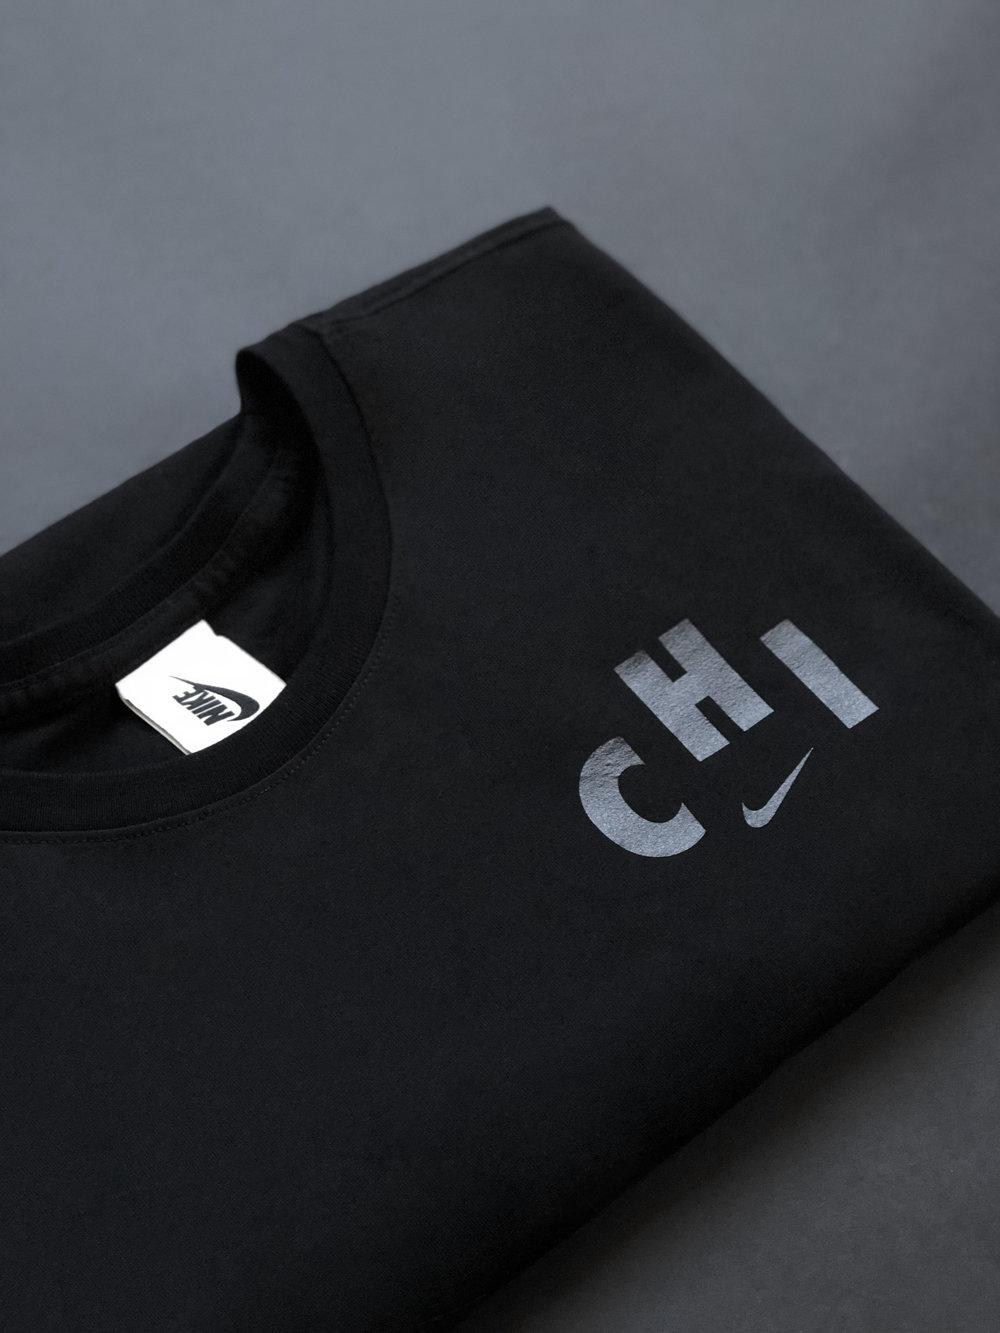 Nike_03_alt.jpg